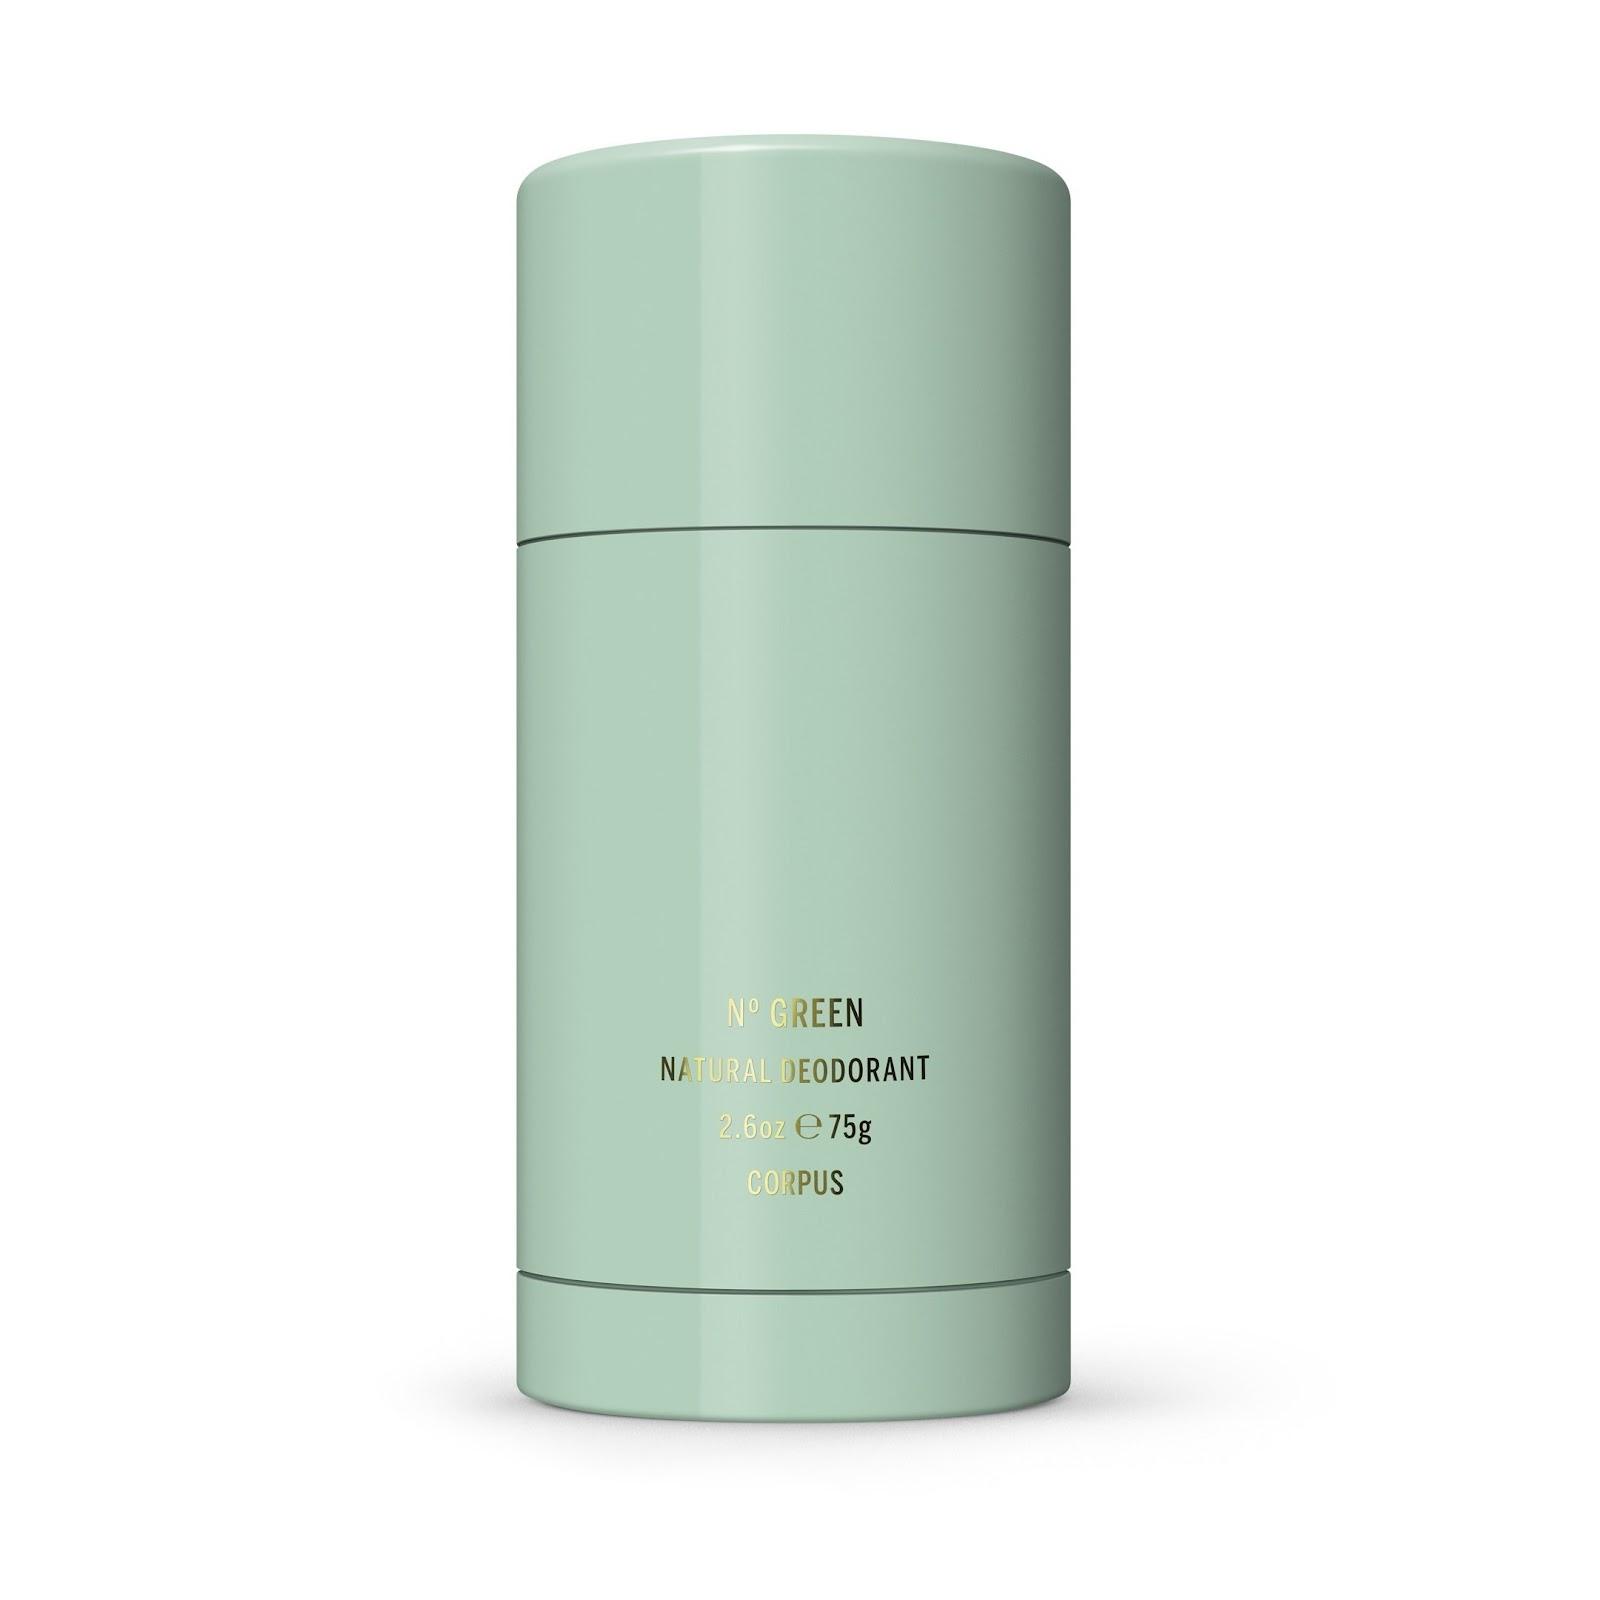 stick of natural deodorant in a mint green case